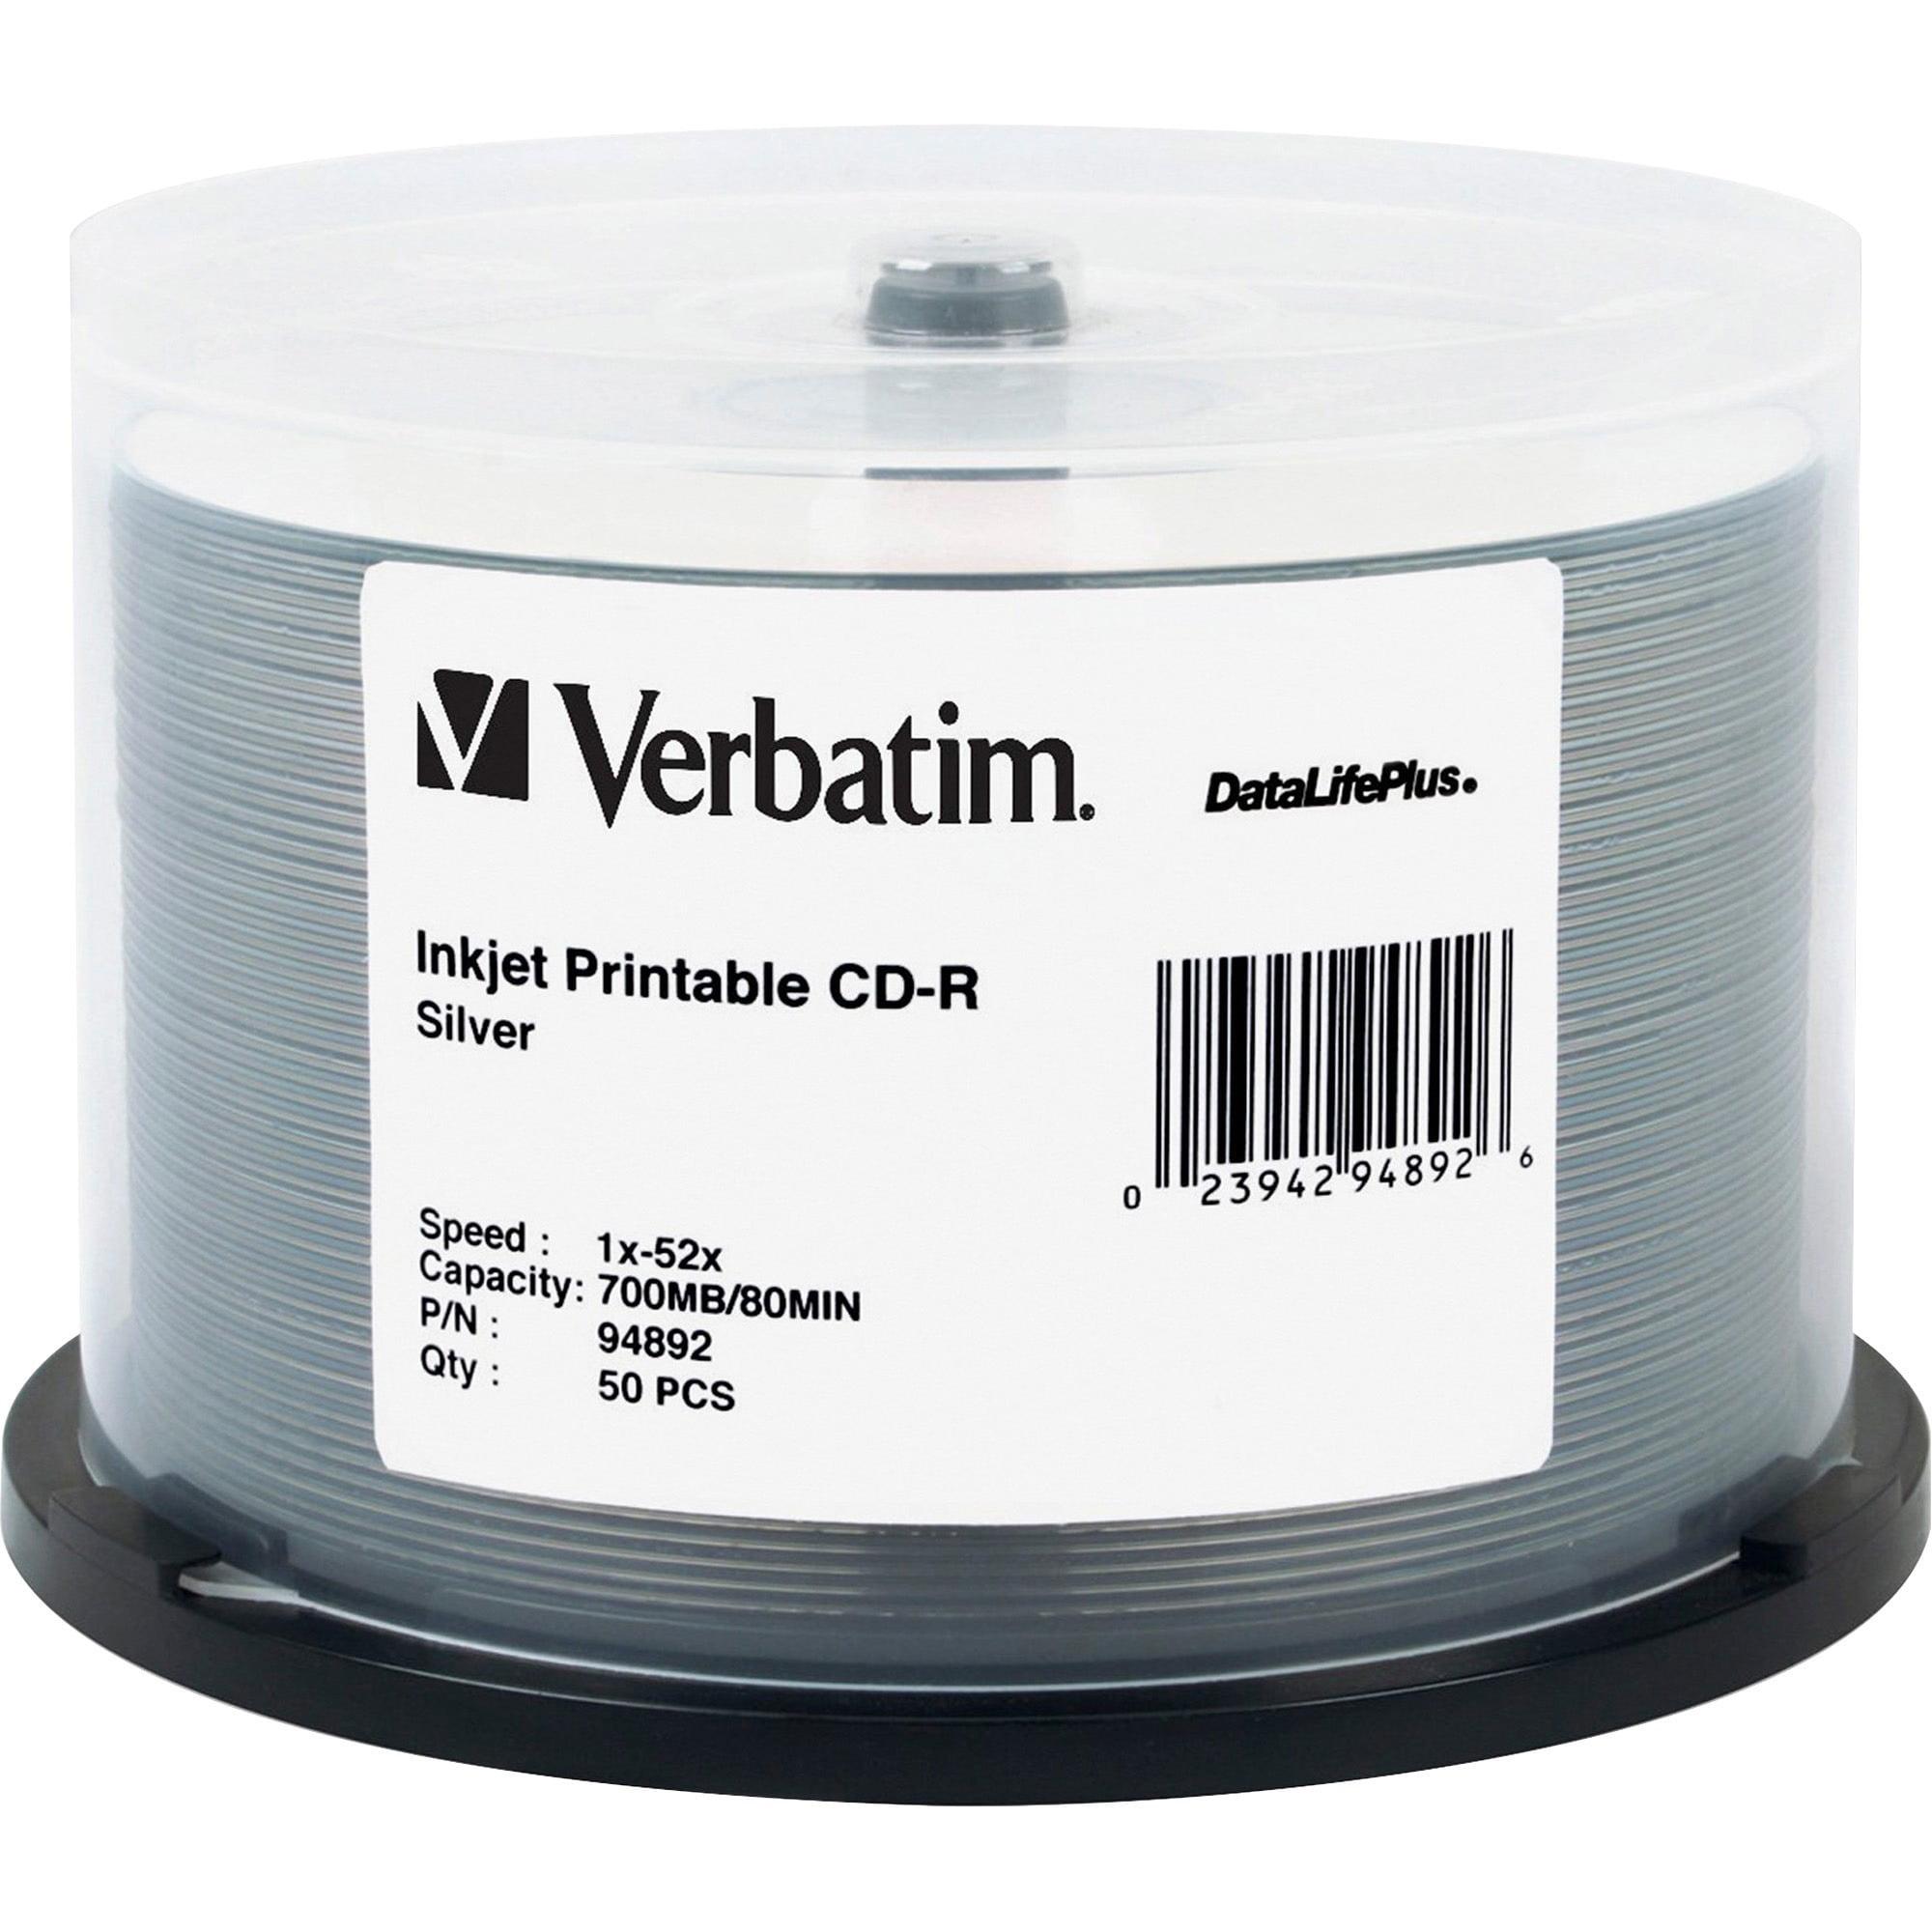 Verbatim, VER94892, Silver Inkjet Printable CD-R Spindle, 50, Silver